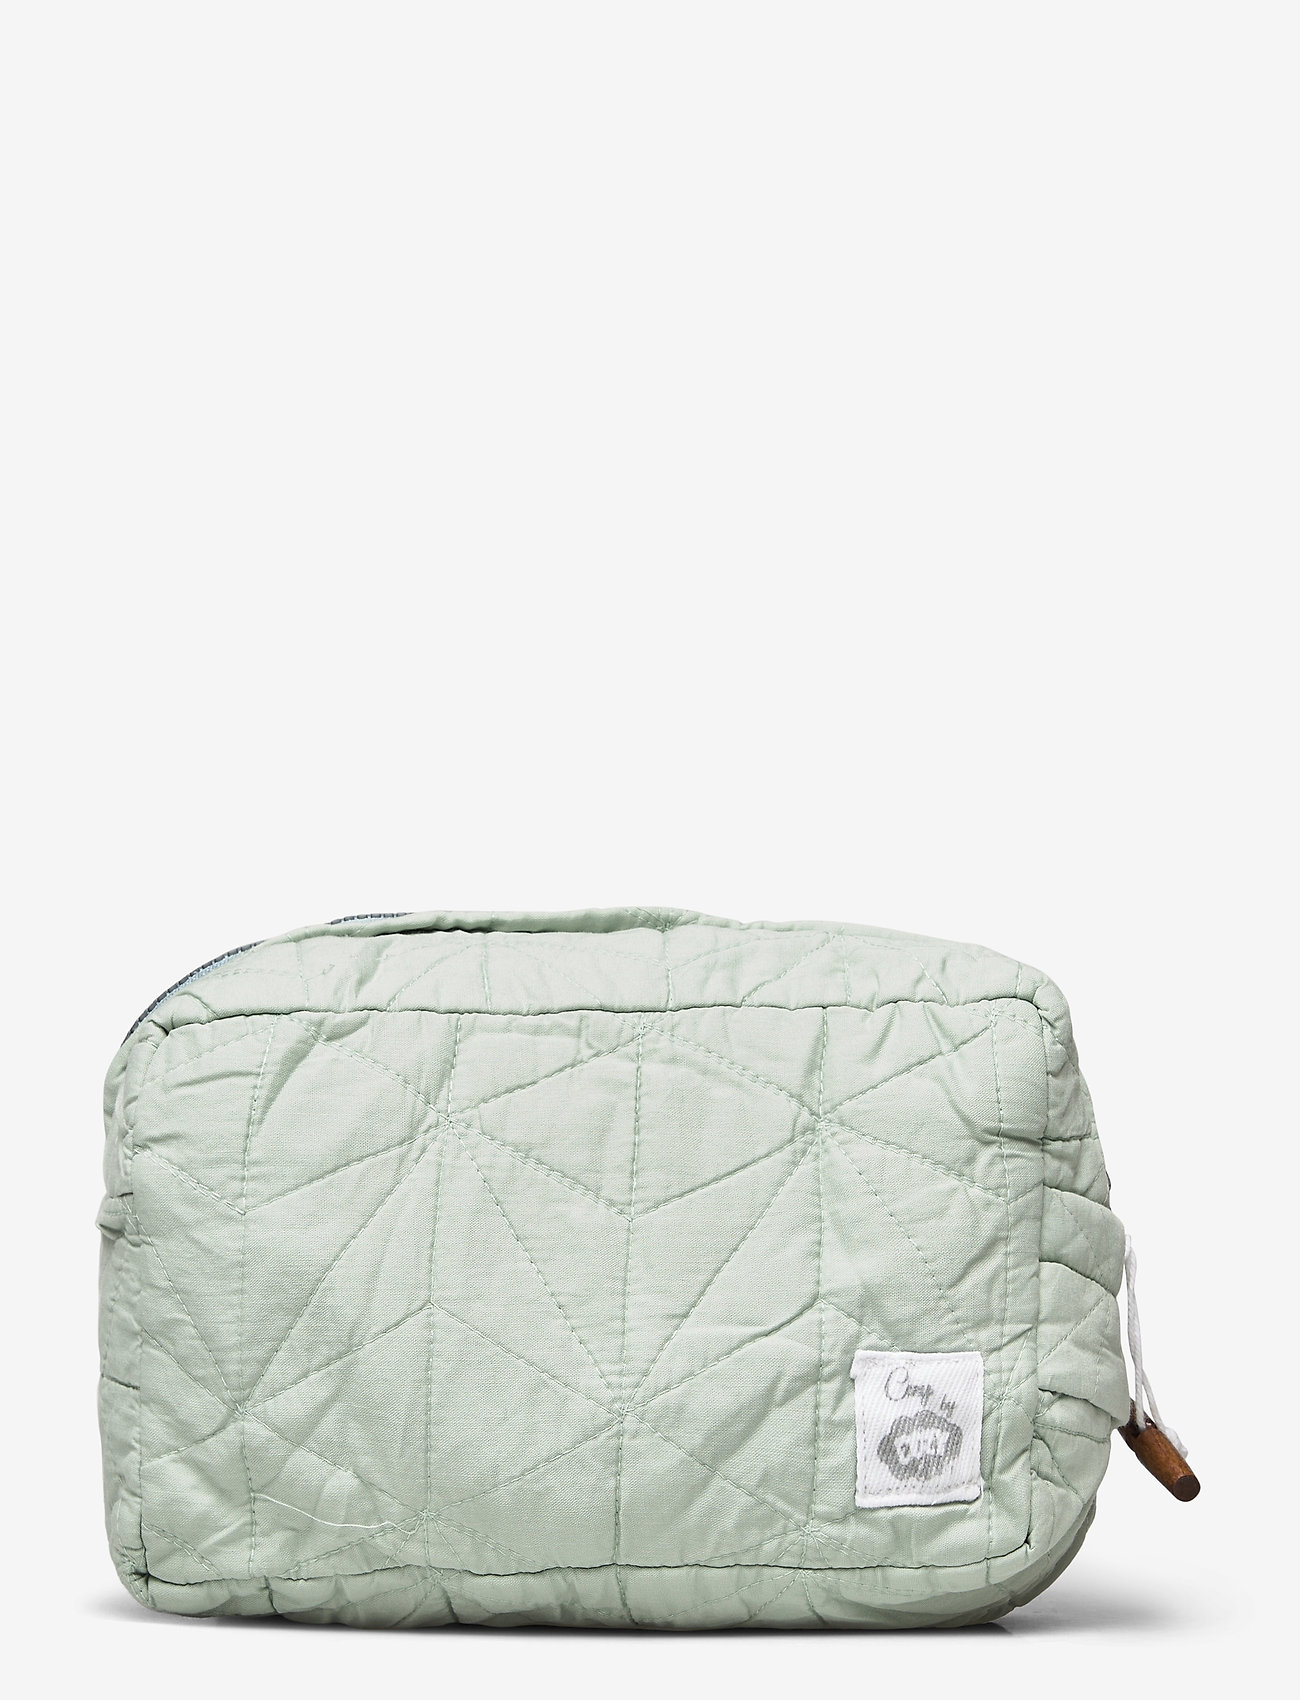 Cozy by Dozy - Cozy by Dozy Toiletry Bag - toiletry bags - green - 0